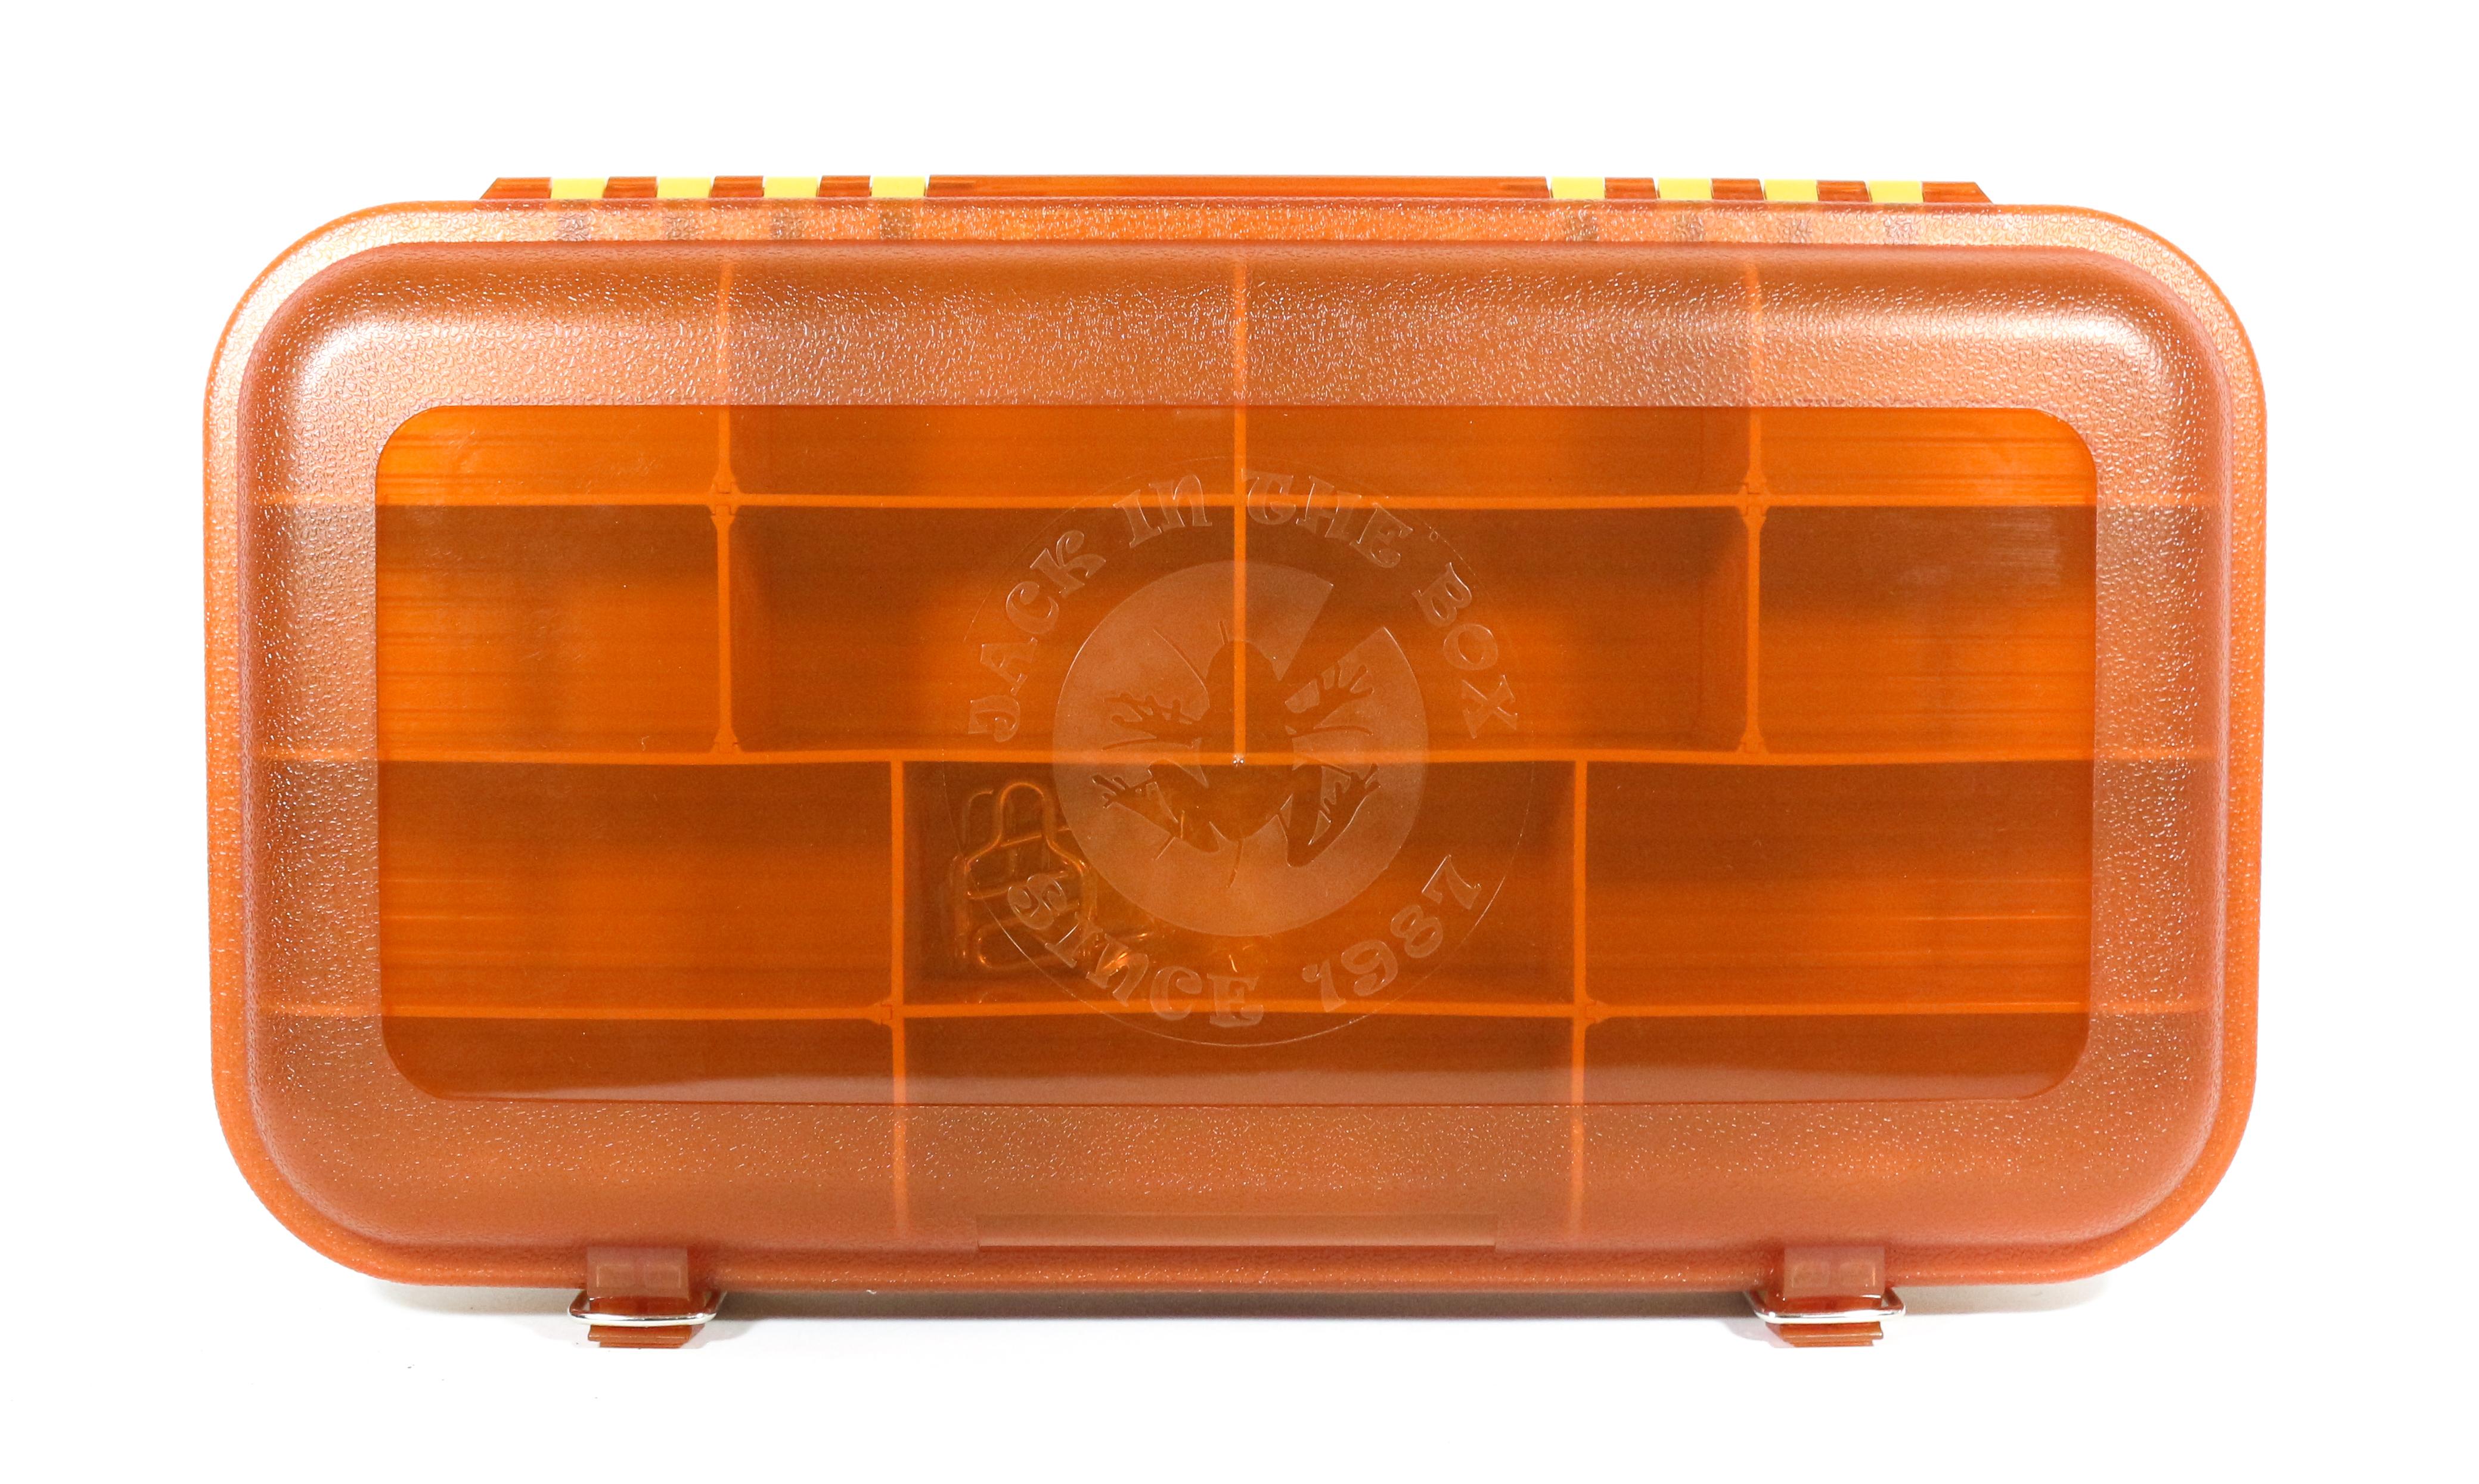 Sale Finesse Pluggin Tackle Lure Box 370 x 210 x 50 mm 01 (7694)